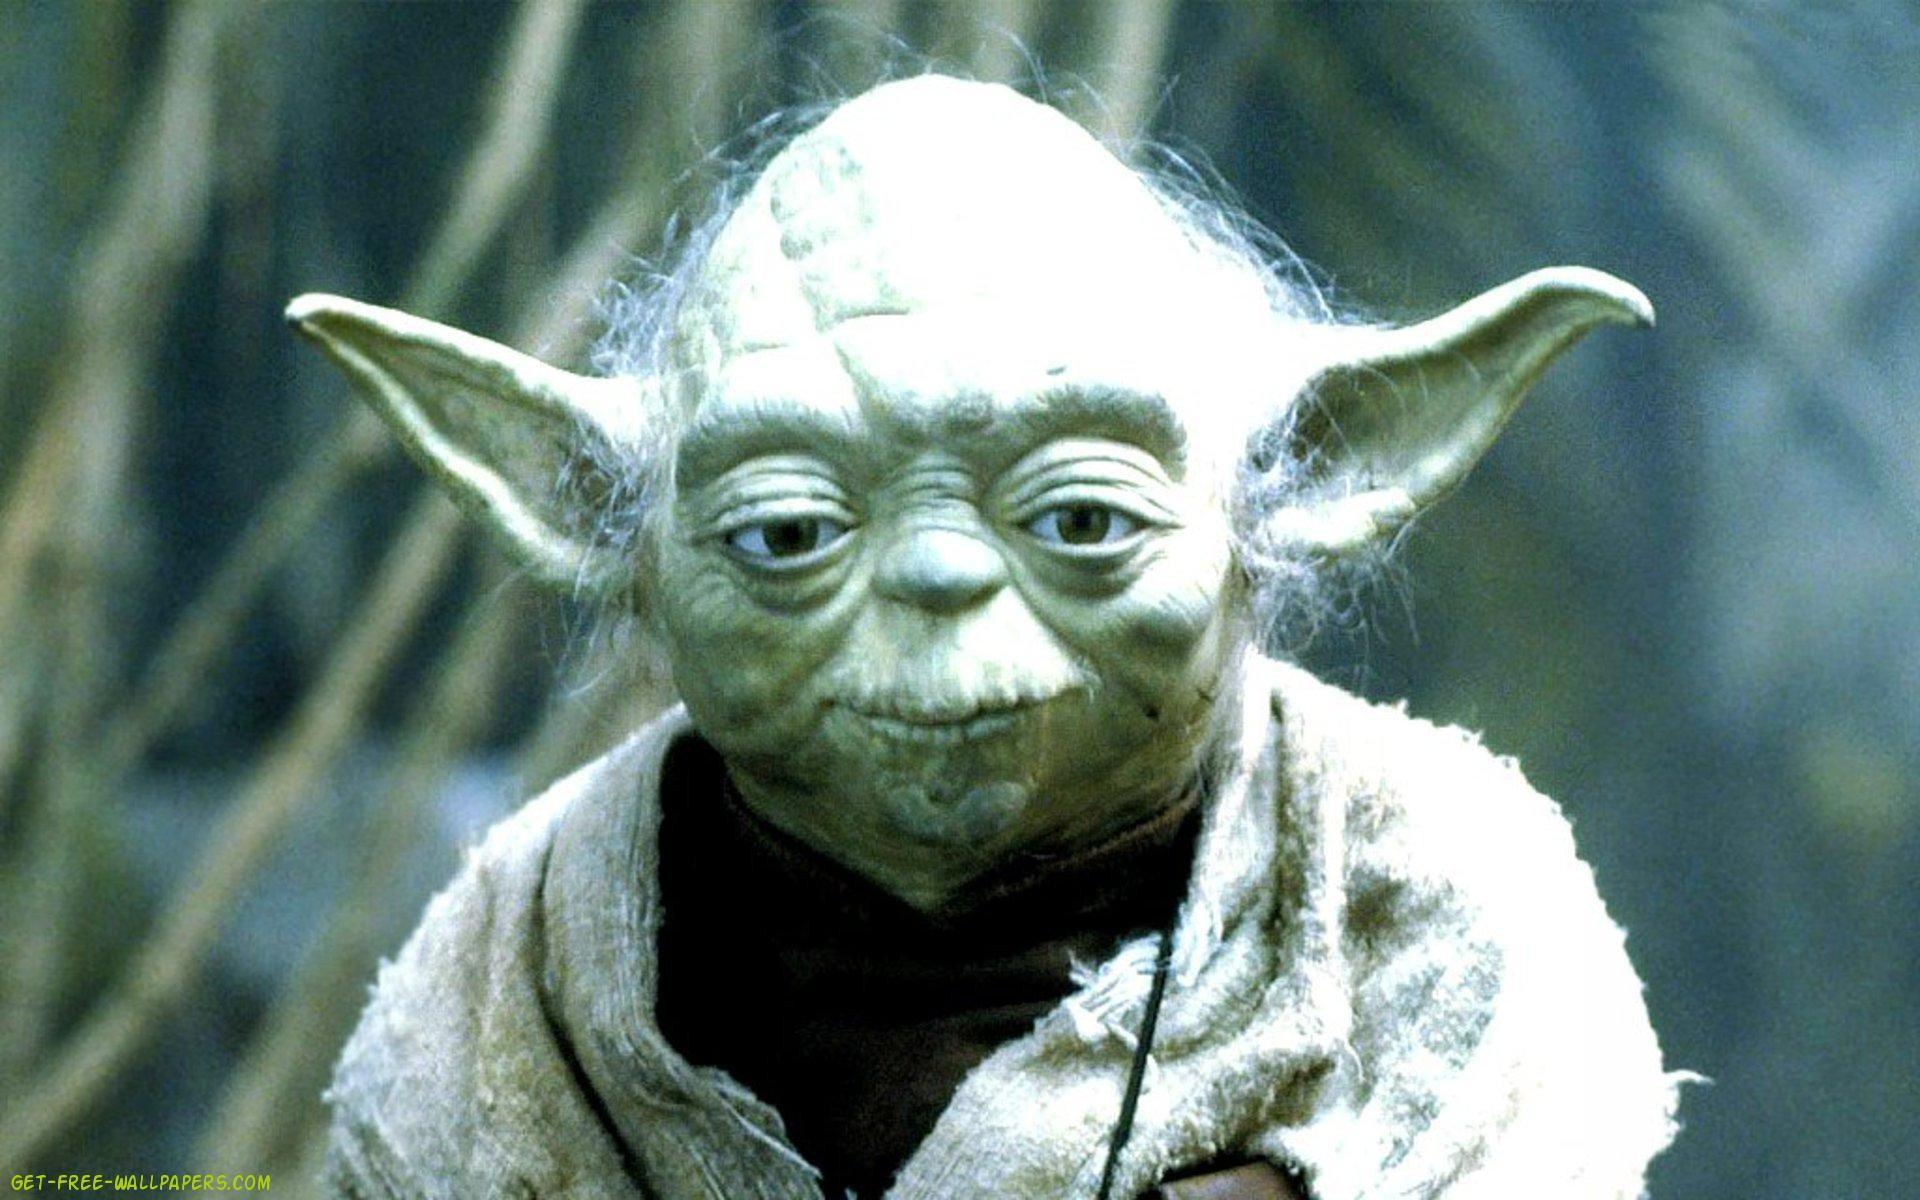 Yoda wallpaper ·① Download free beautiful High Resolution